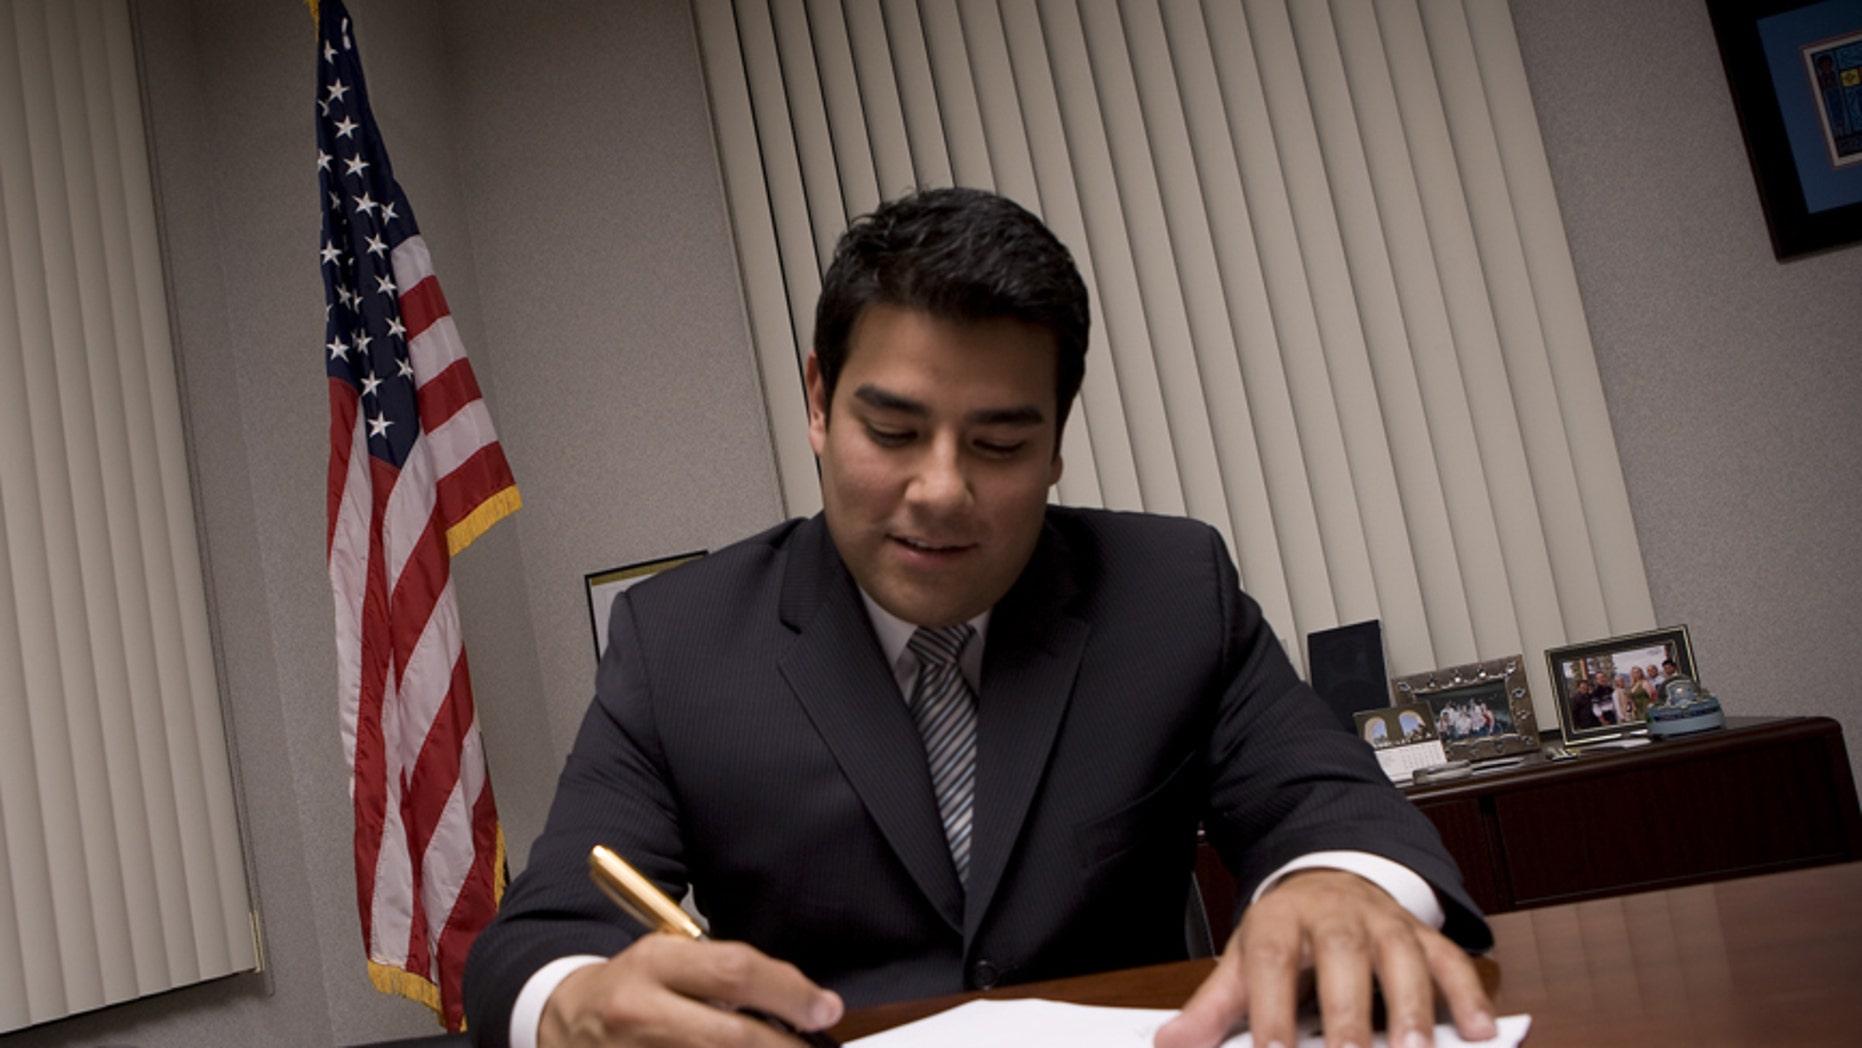 California State Sen. Ricardo Lara, Democrat